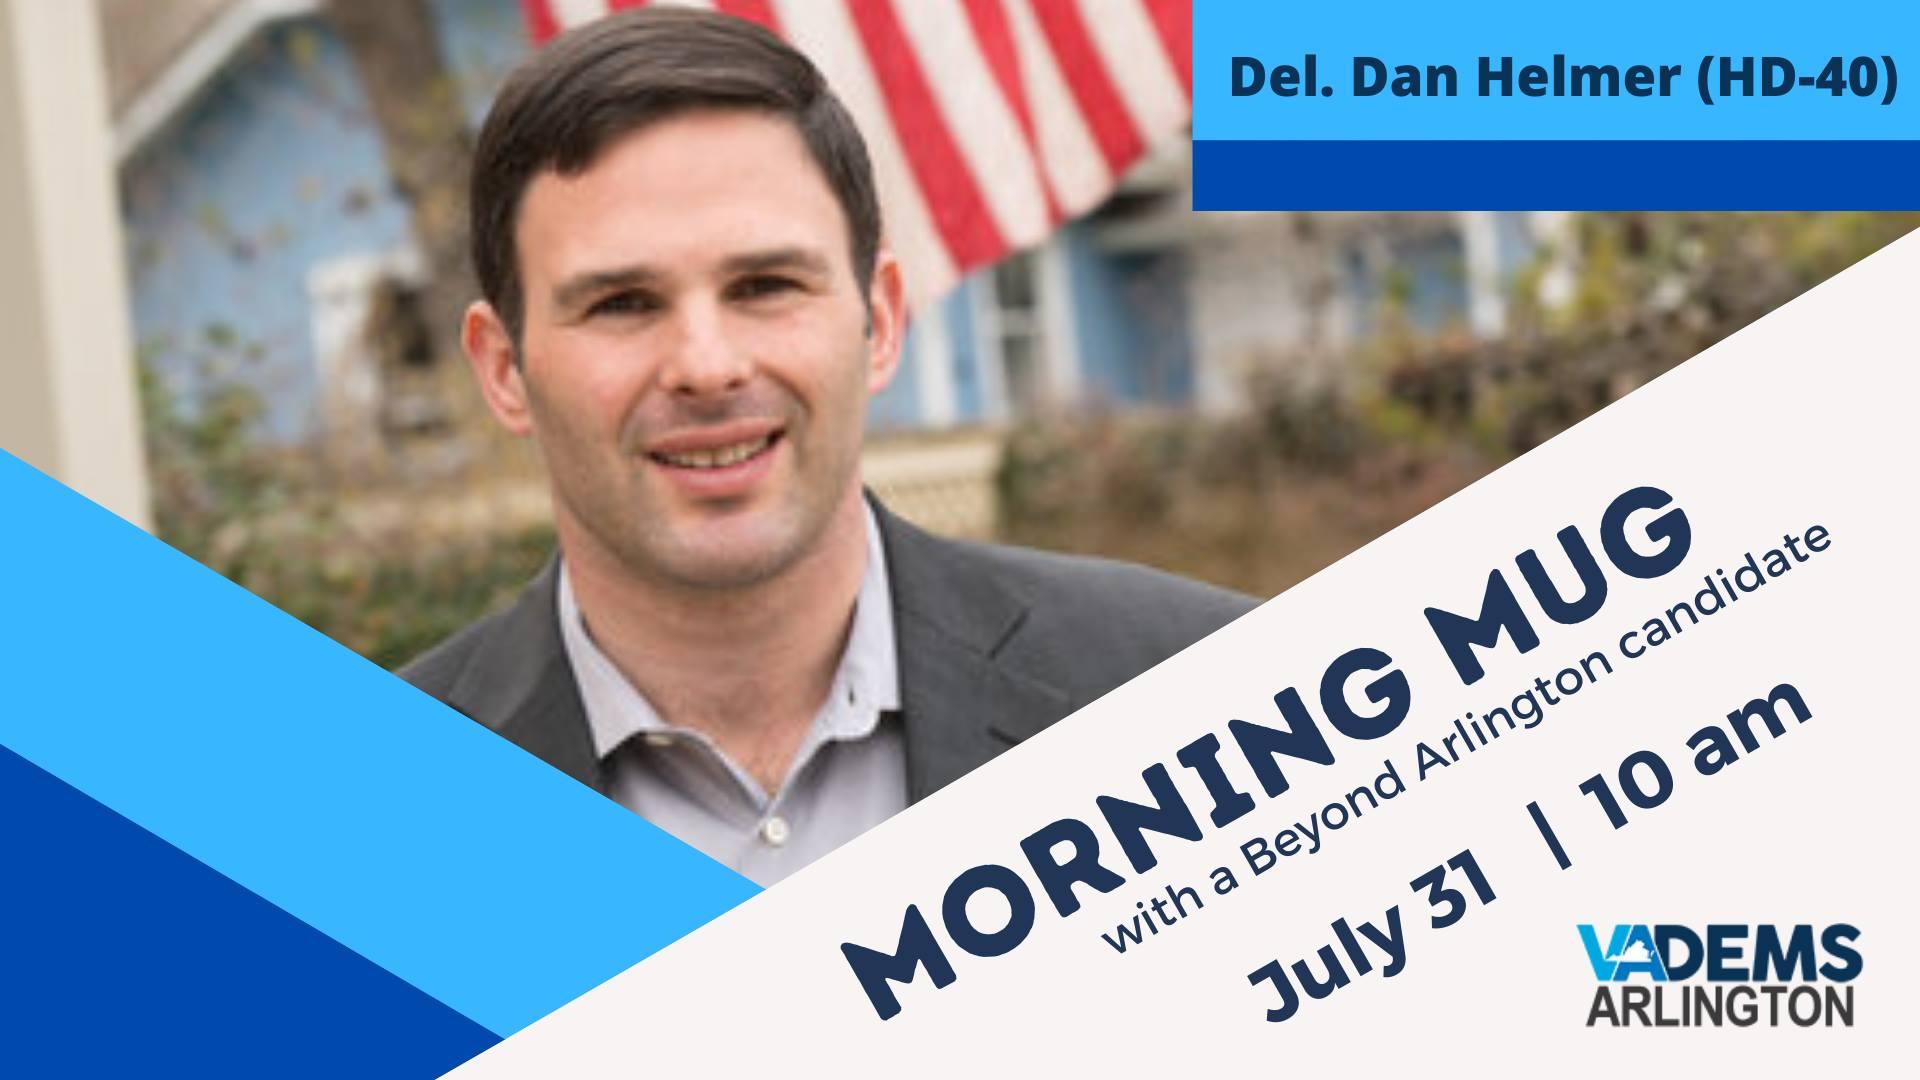 Morning Mug with Del. Dan Helmer